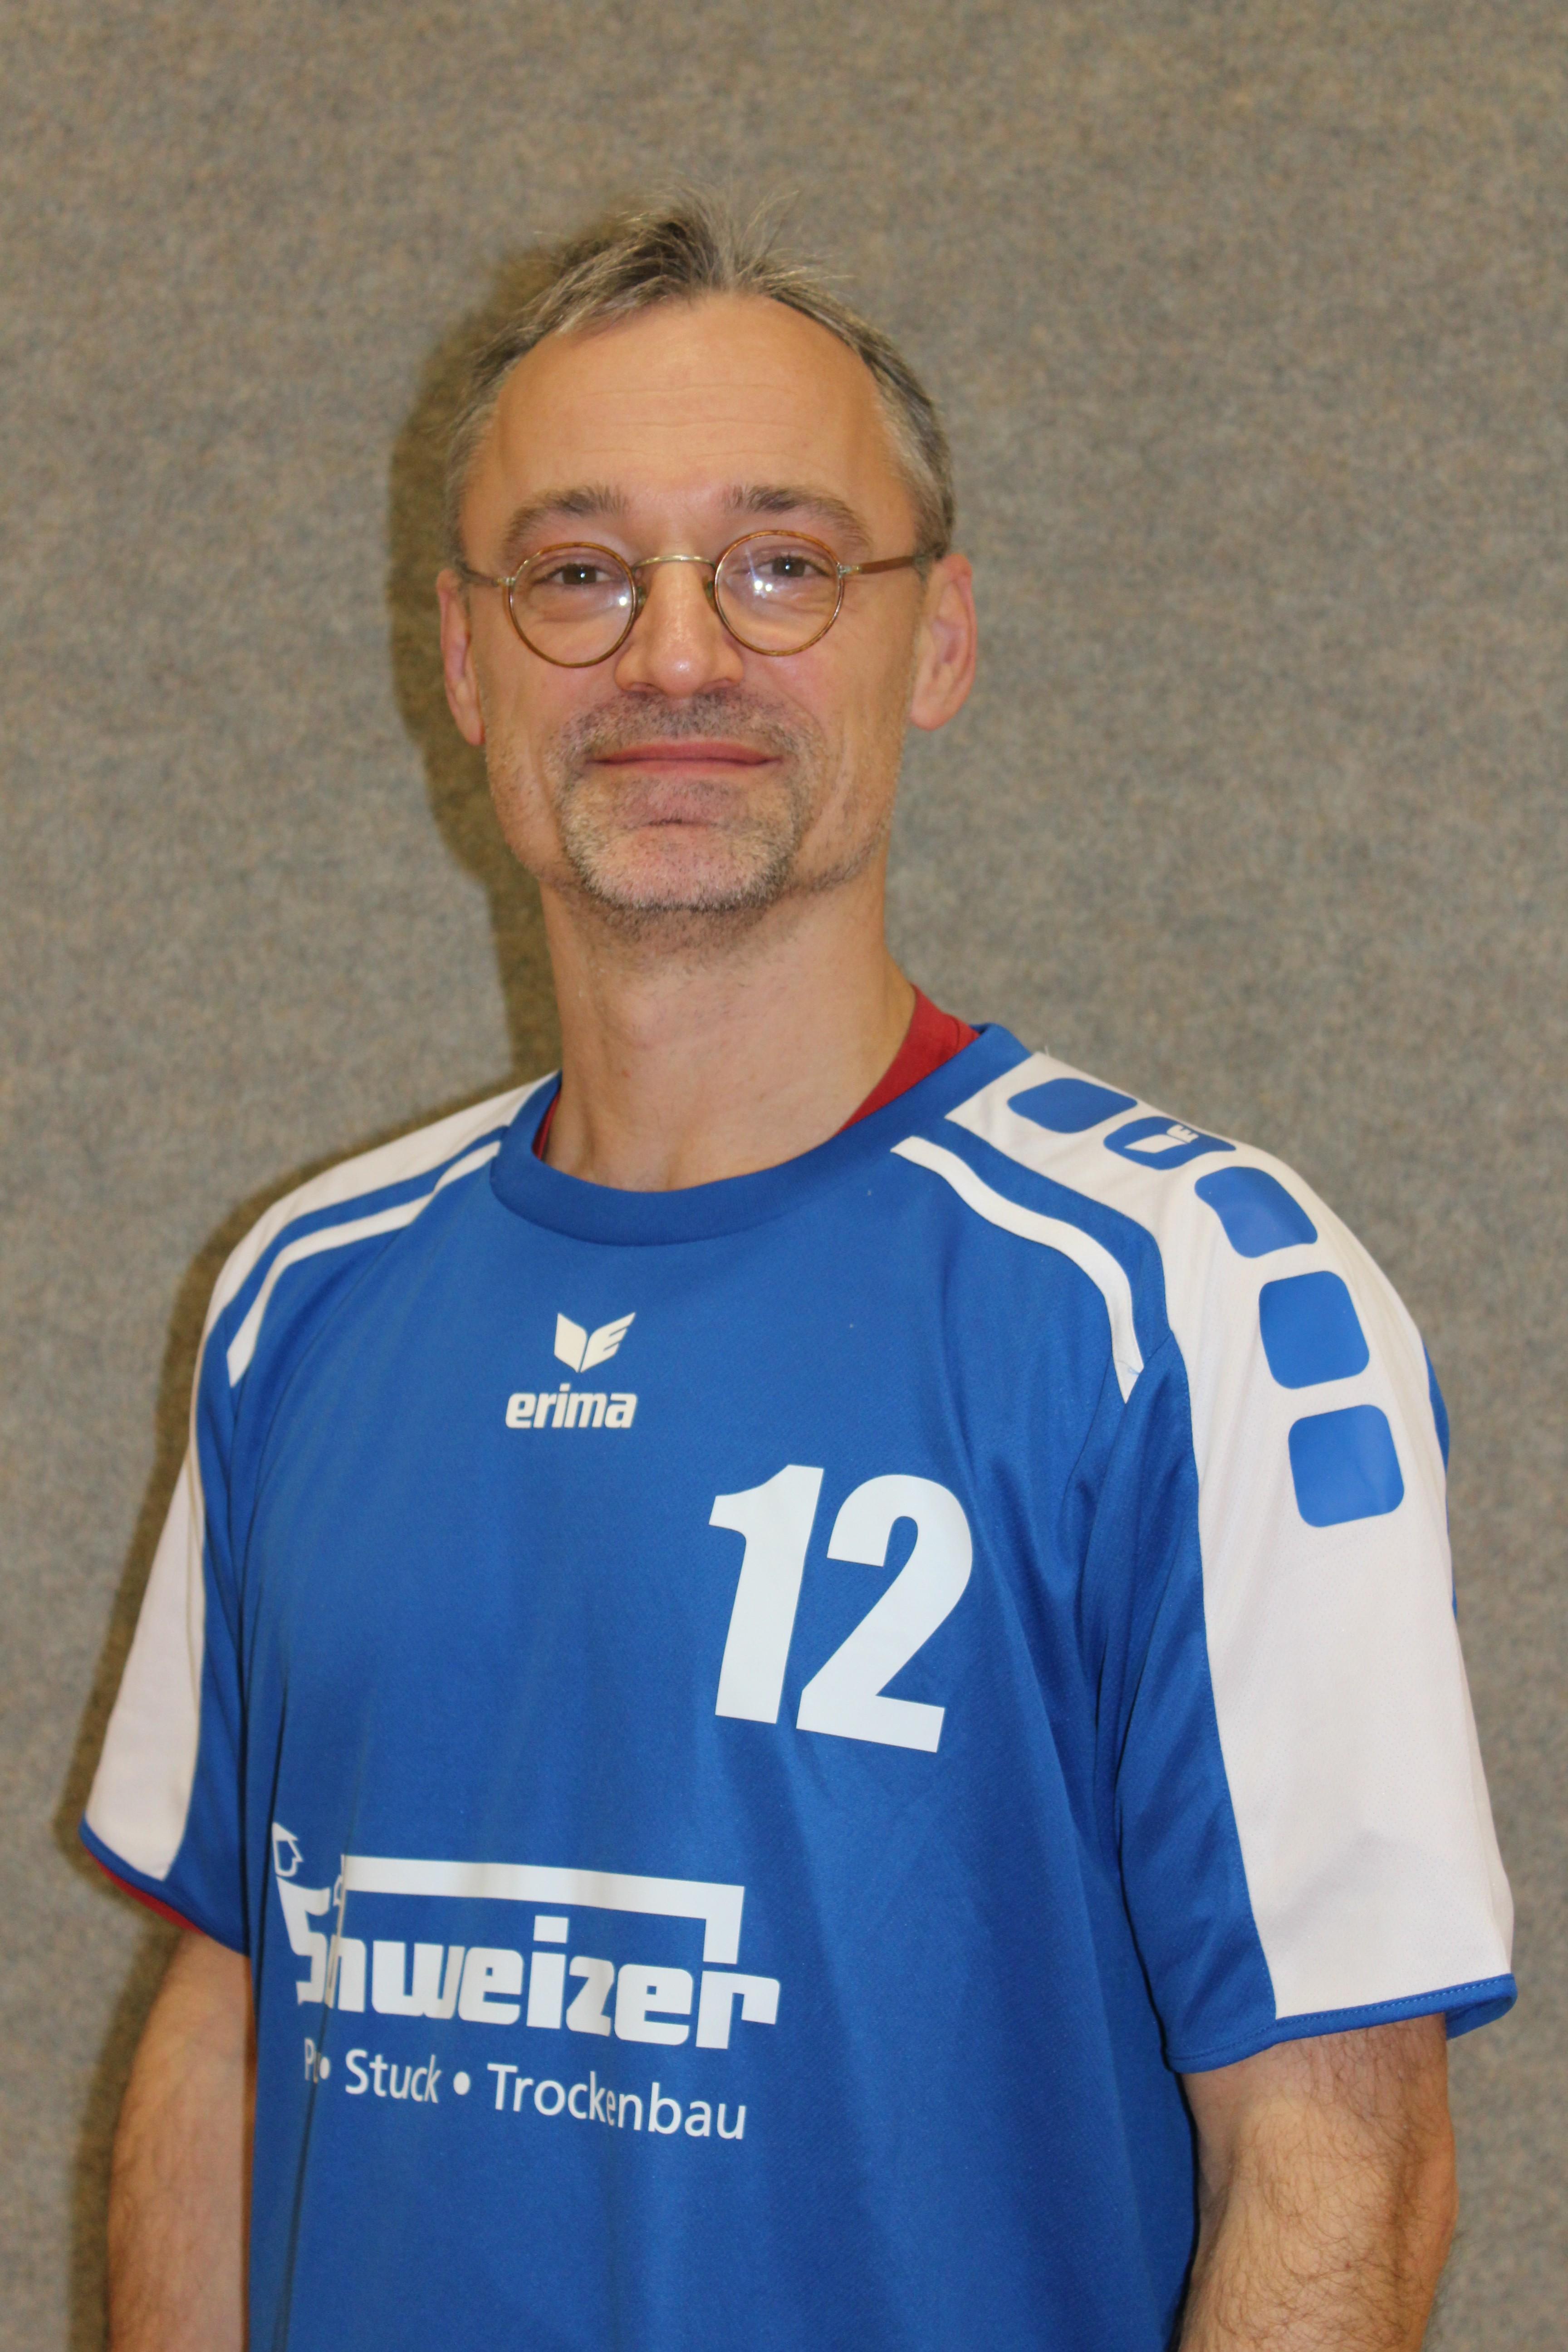 Cord Bertko Trikotnummer: 12 Position: Mittelblock Größe: